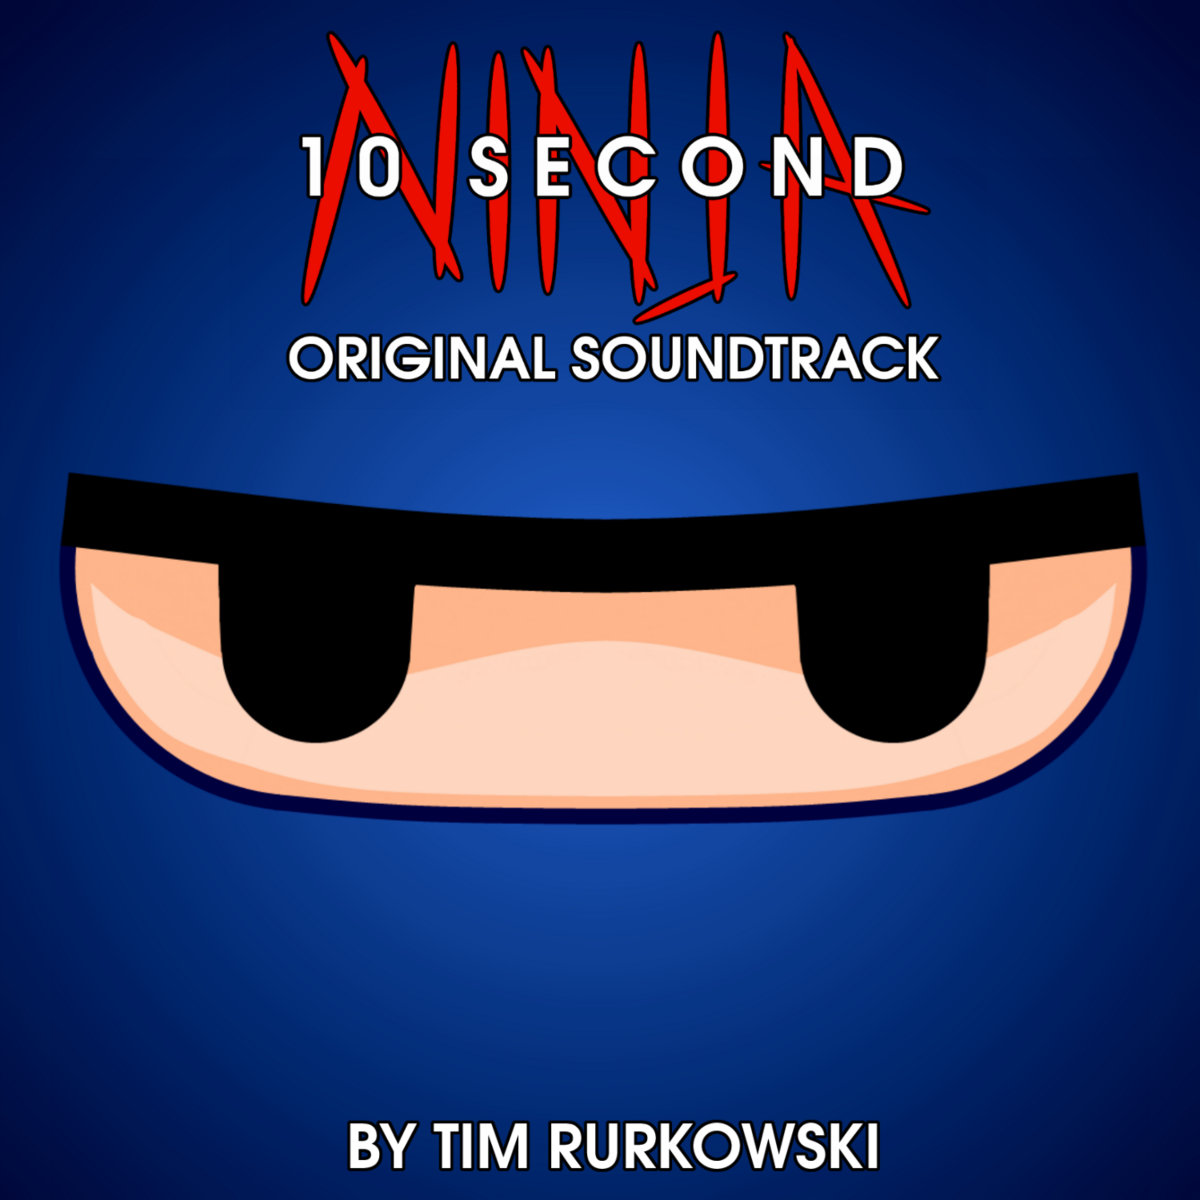 10 Second Ninja OST | Tim Rurkowski